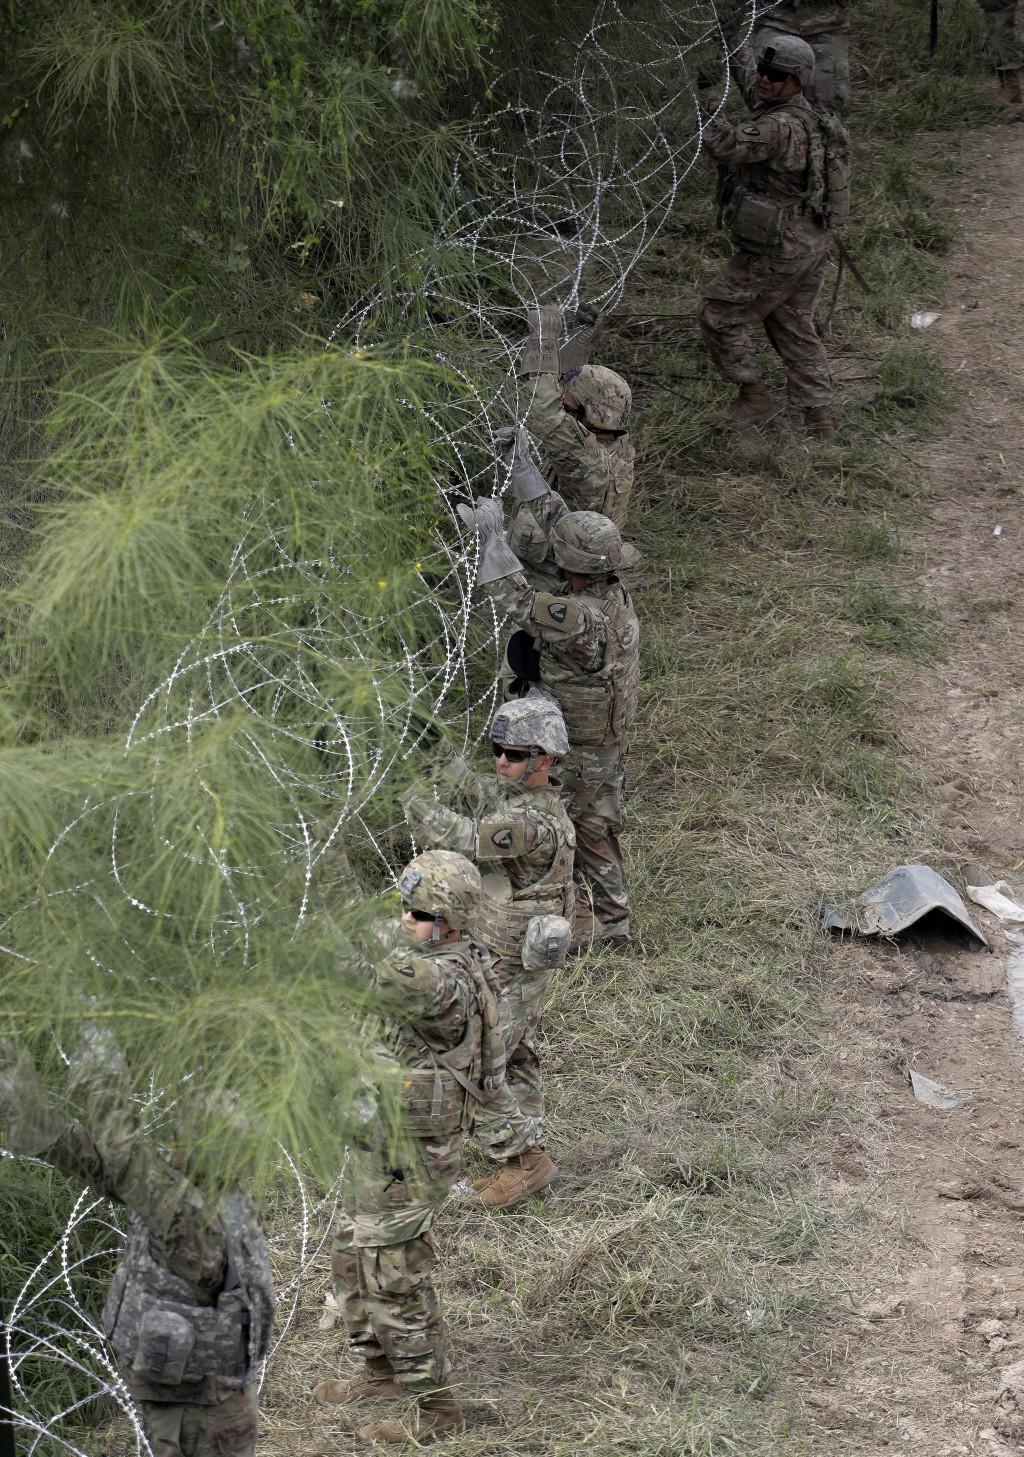 Members of the U.S. military place razor wire along the U.S.-Mexico border near the McAllen-Hidalgo International Bridge, Friday, Nov. 2, 2018, in McA